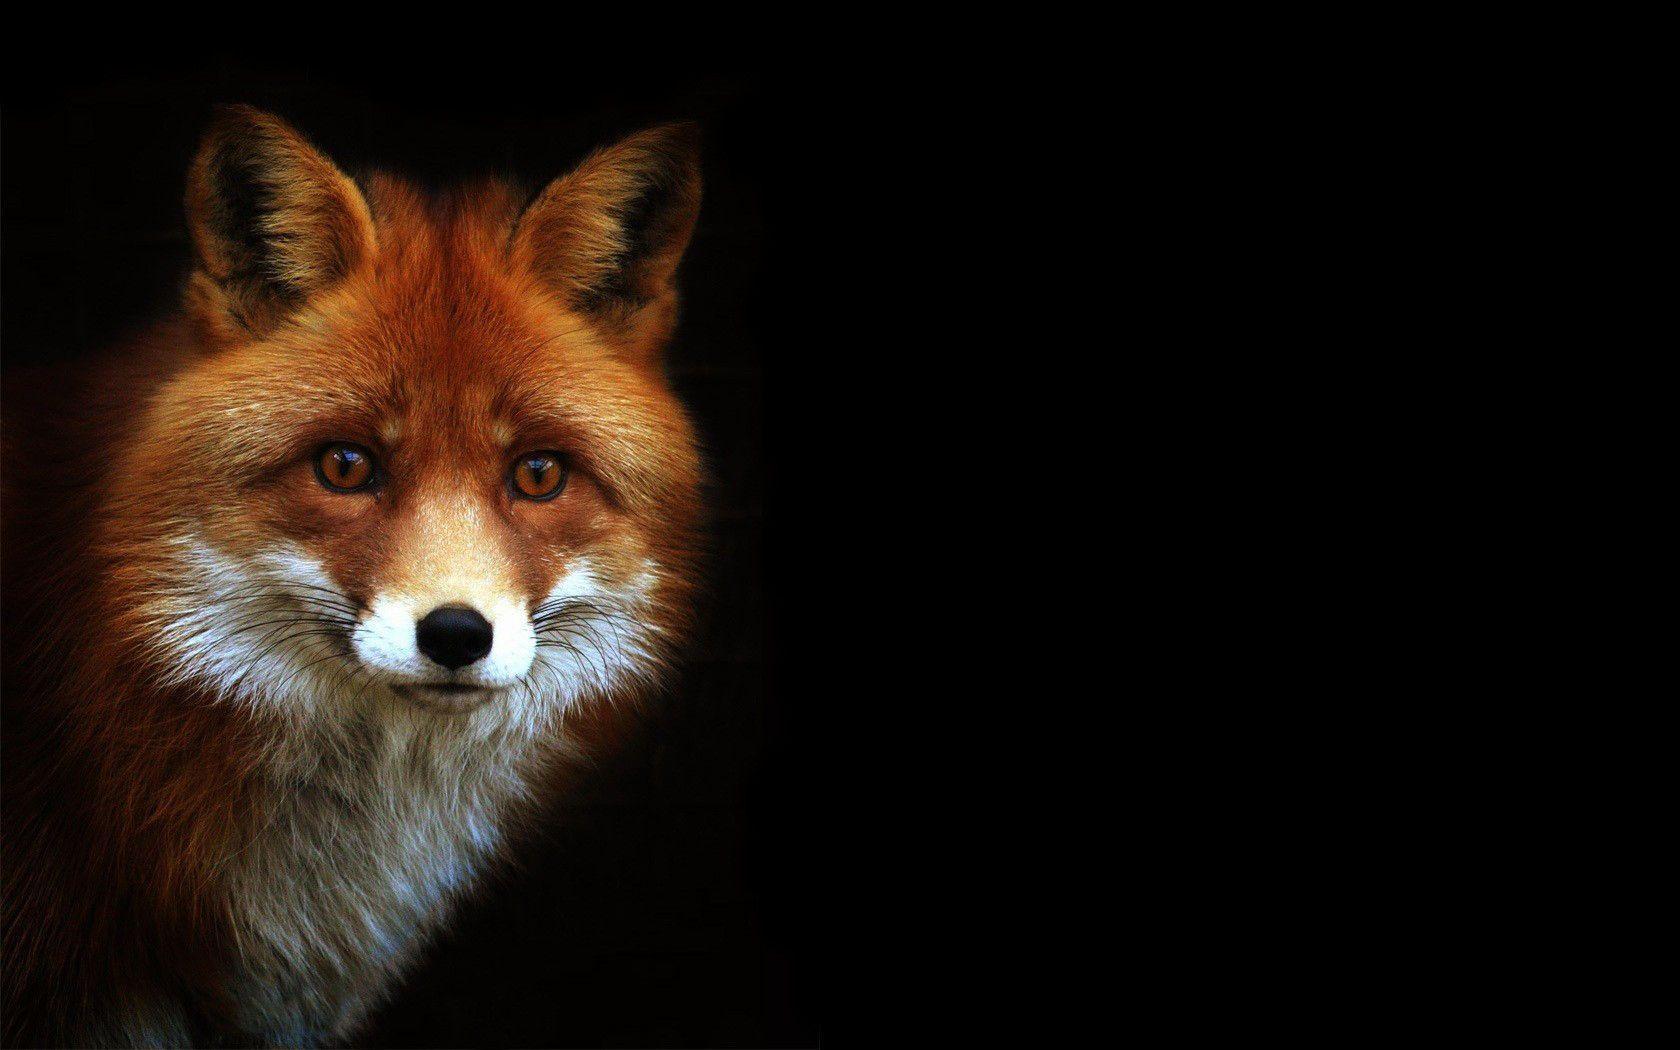 Black Fox Wallpapers Top Free Black Fox Backgrounds